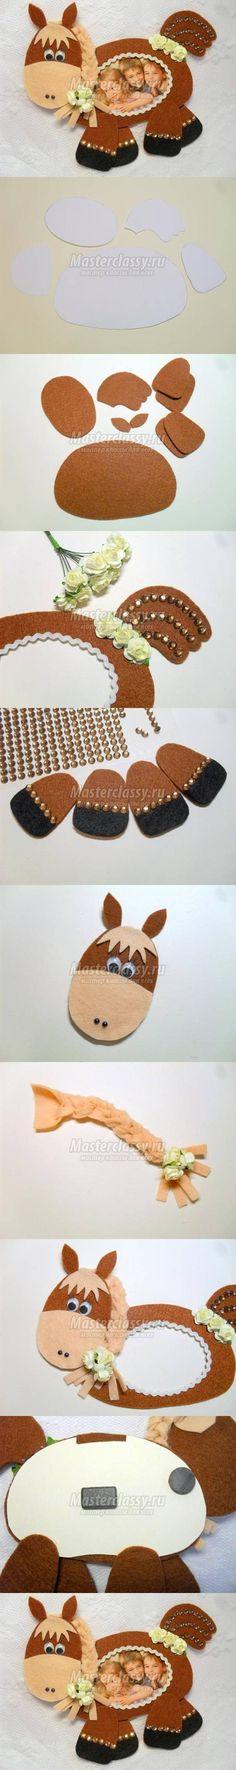 DIY Felt Horse Picture Frame DIY Projects   UsefulDIY.com Follow Us on Facebook ==> http://www.facebook.com/UsefulDiy